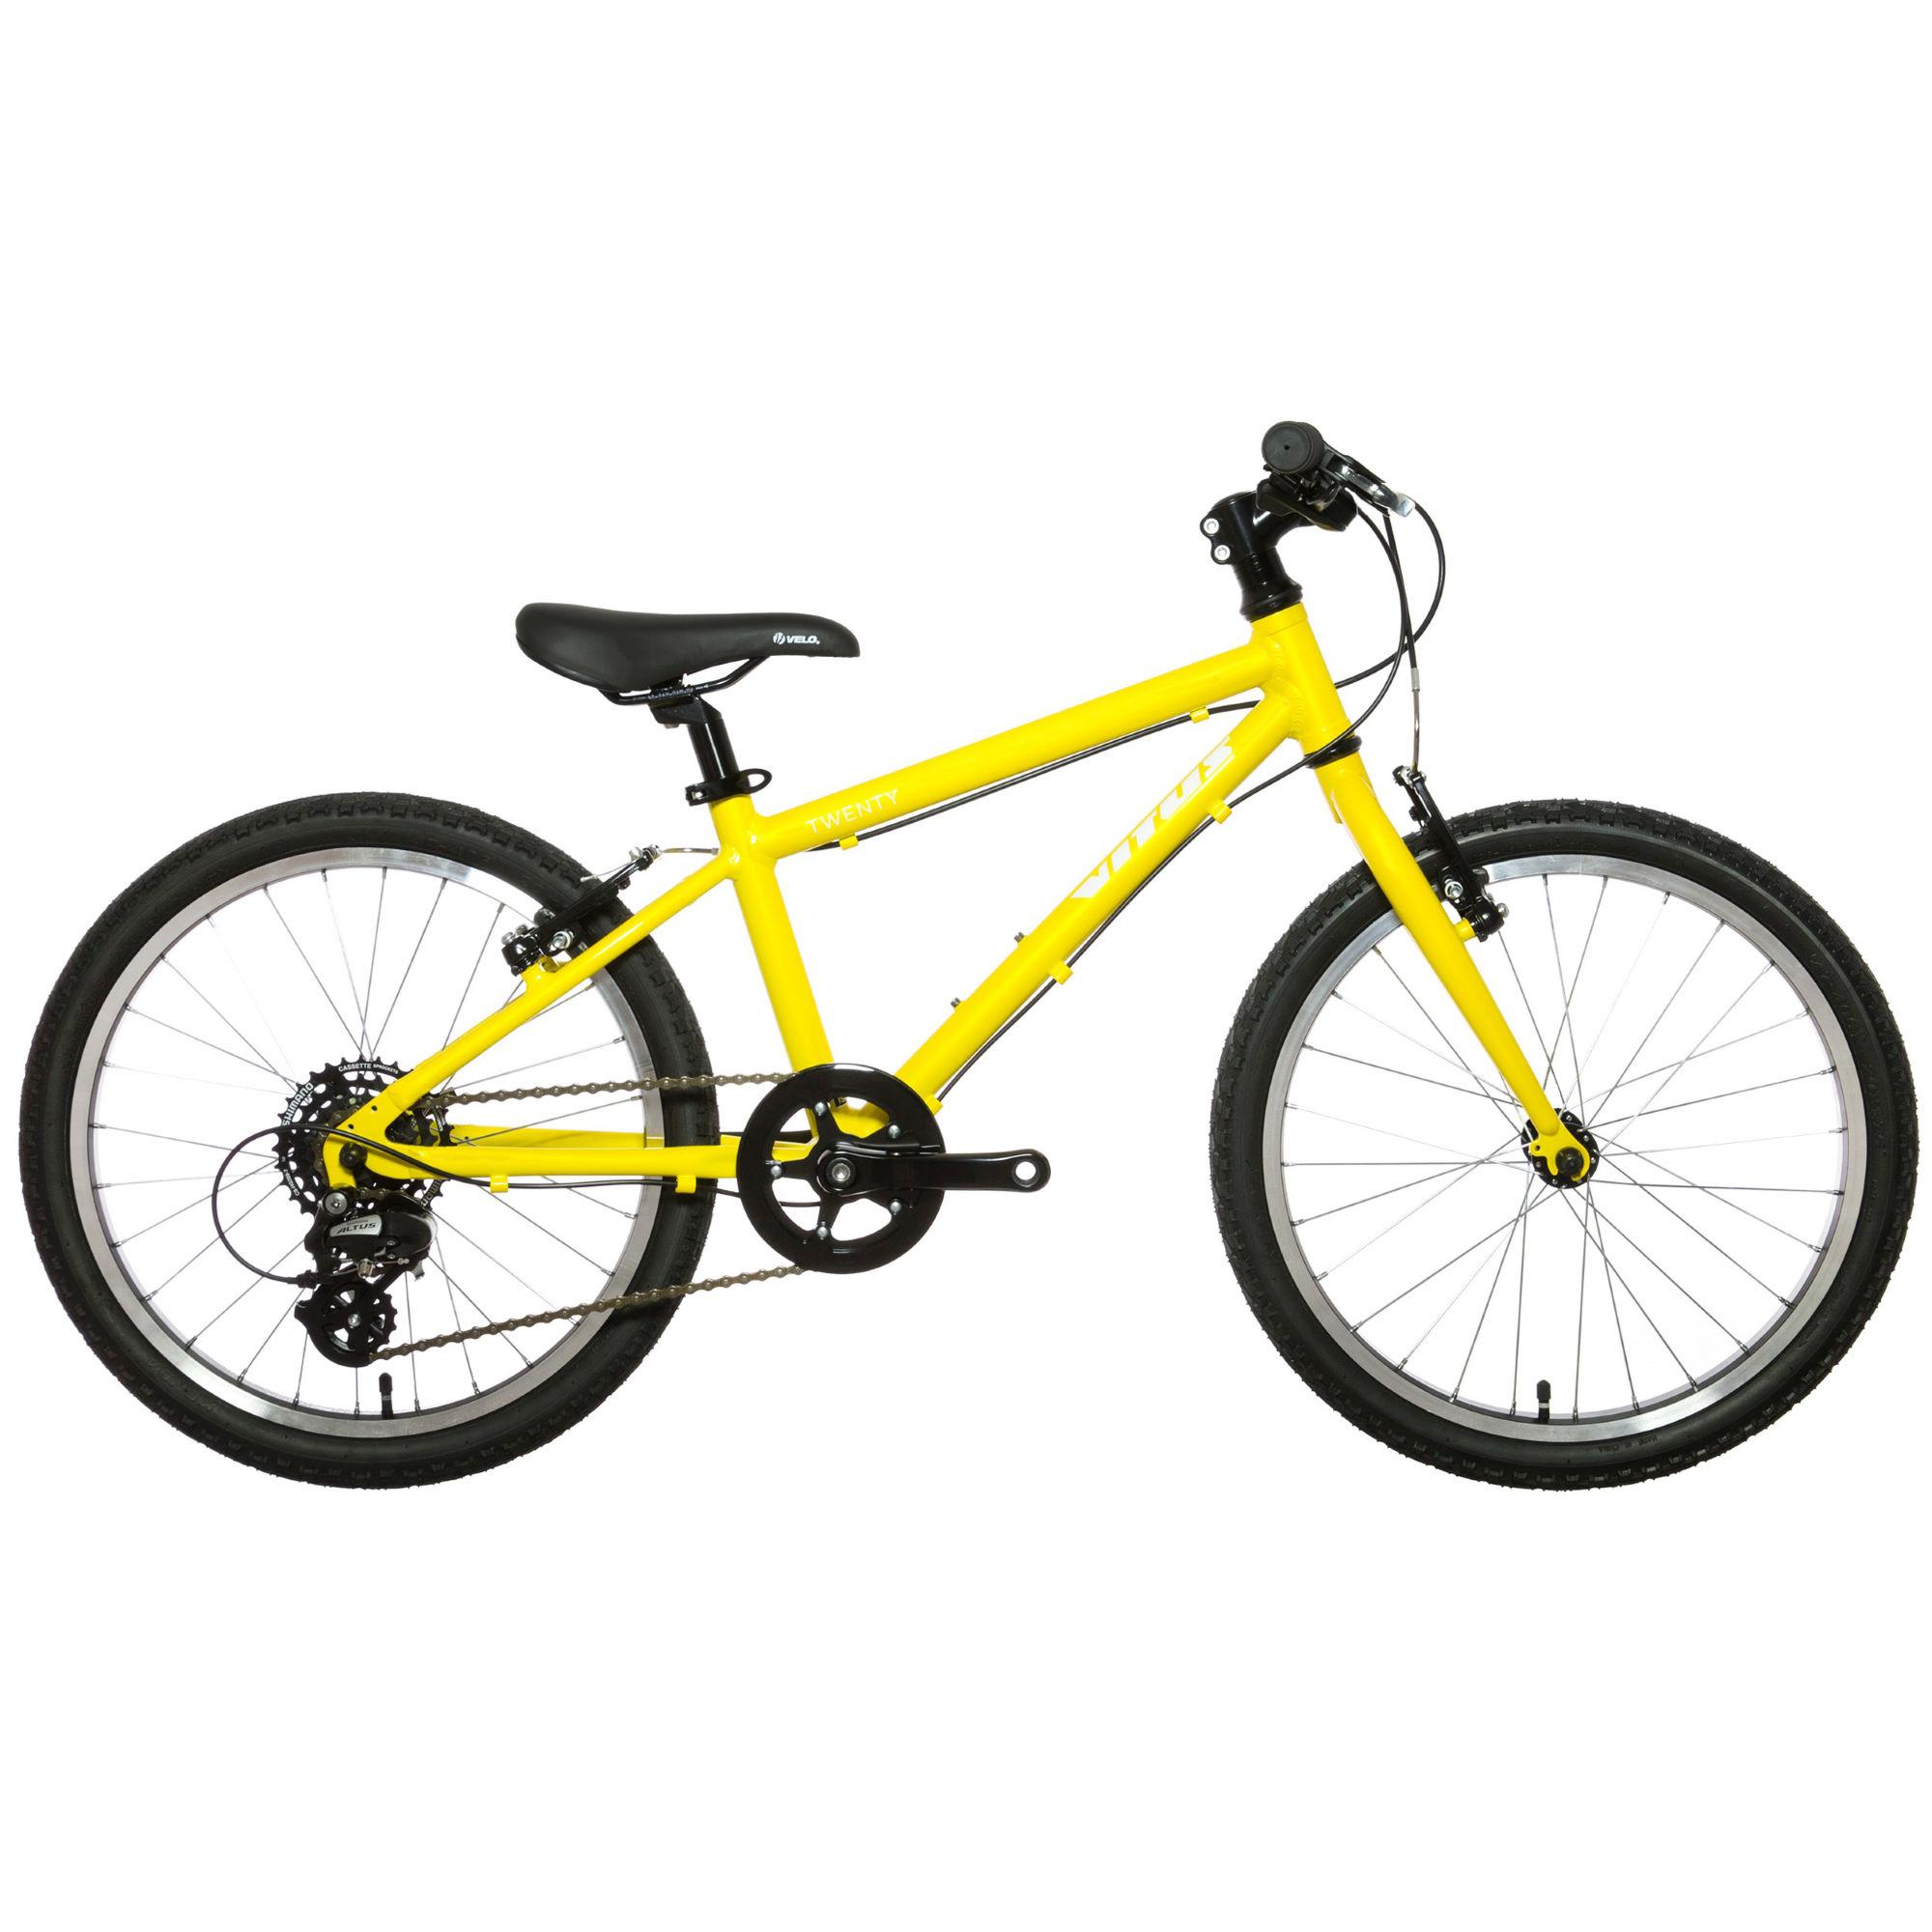 "Childs Vitus Twenty (20"") Bike (about 7-9 year old) - £149.99 @ Wiggle"